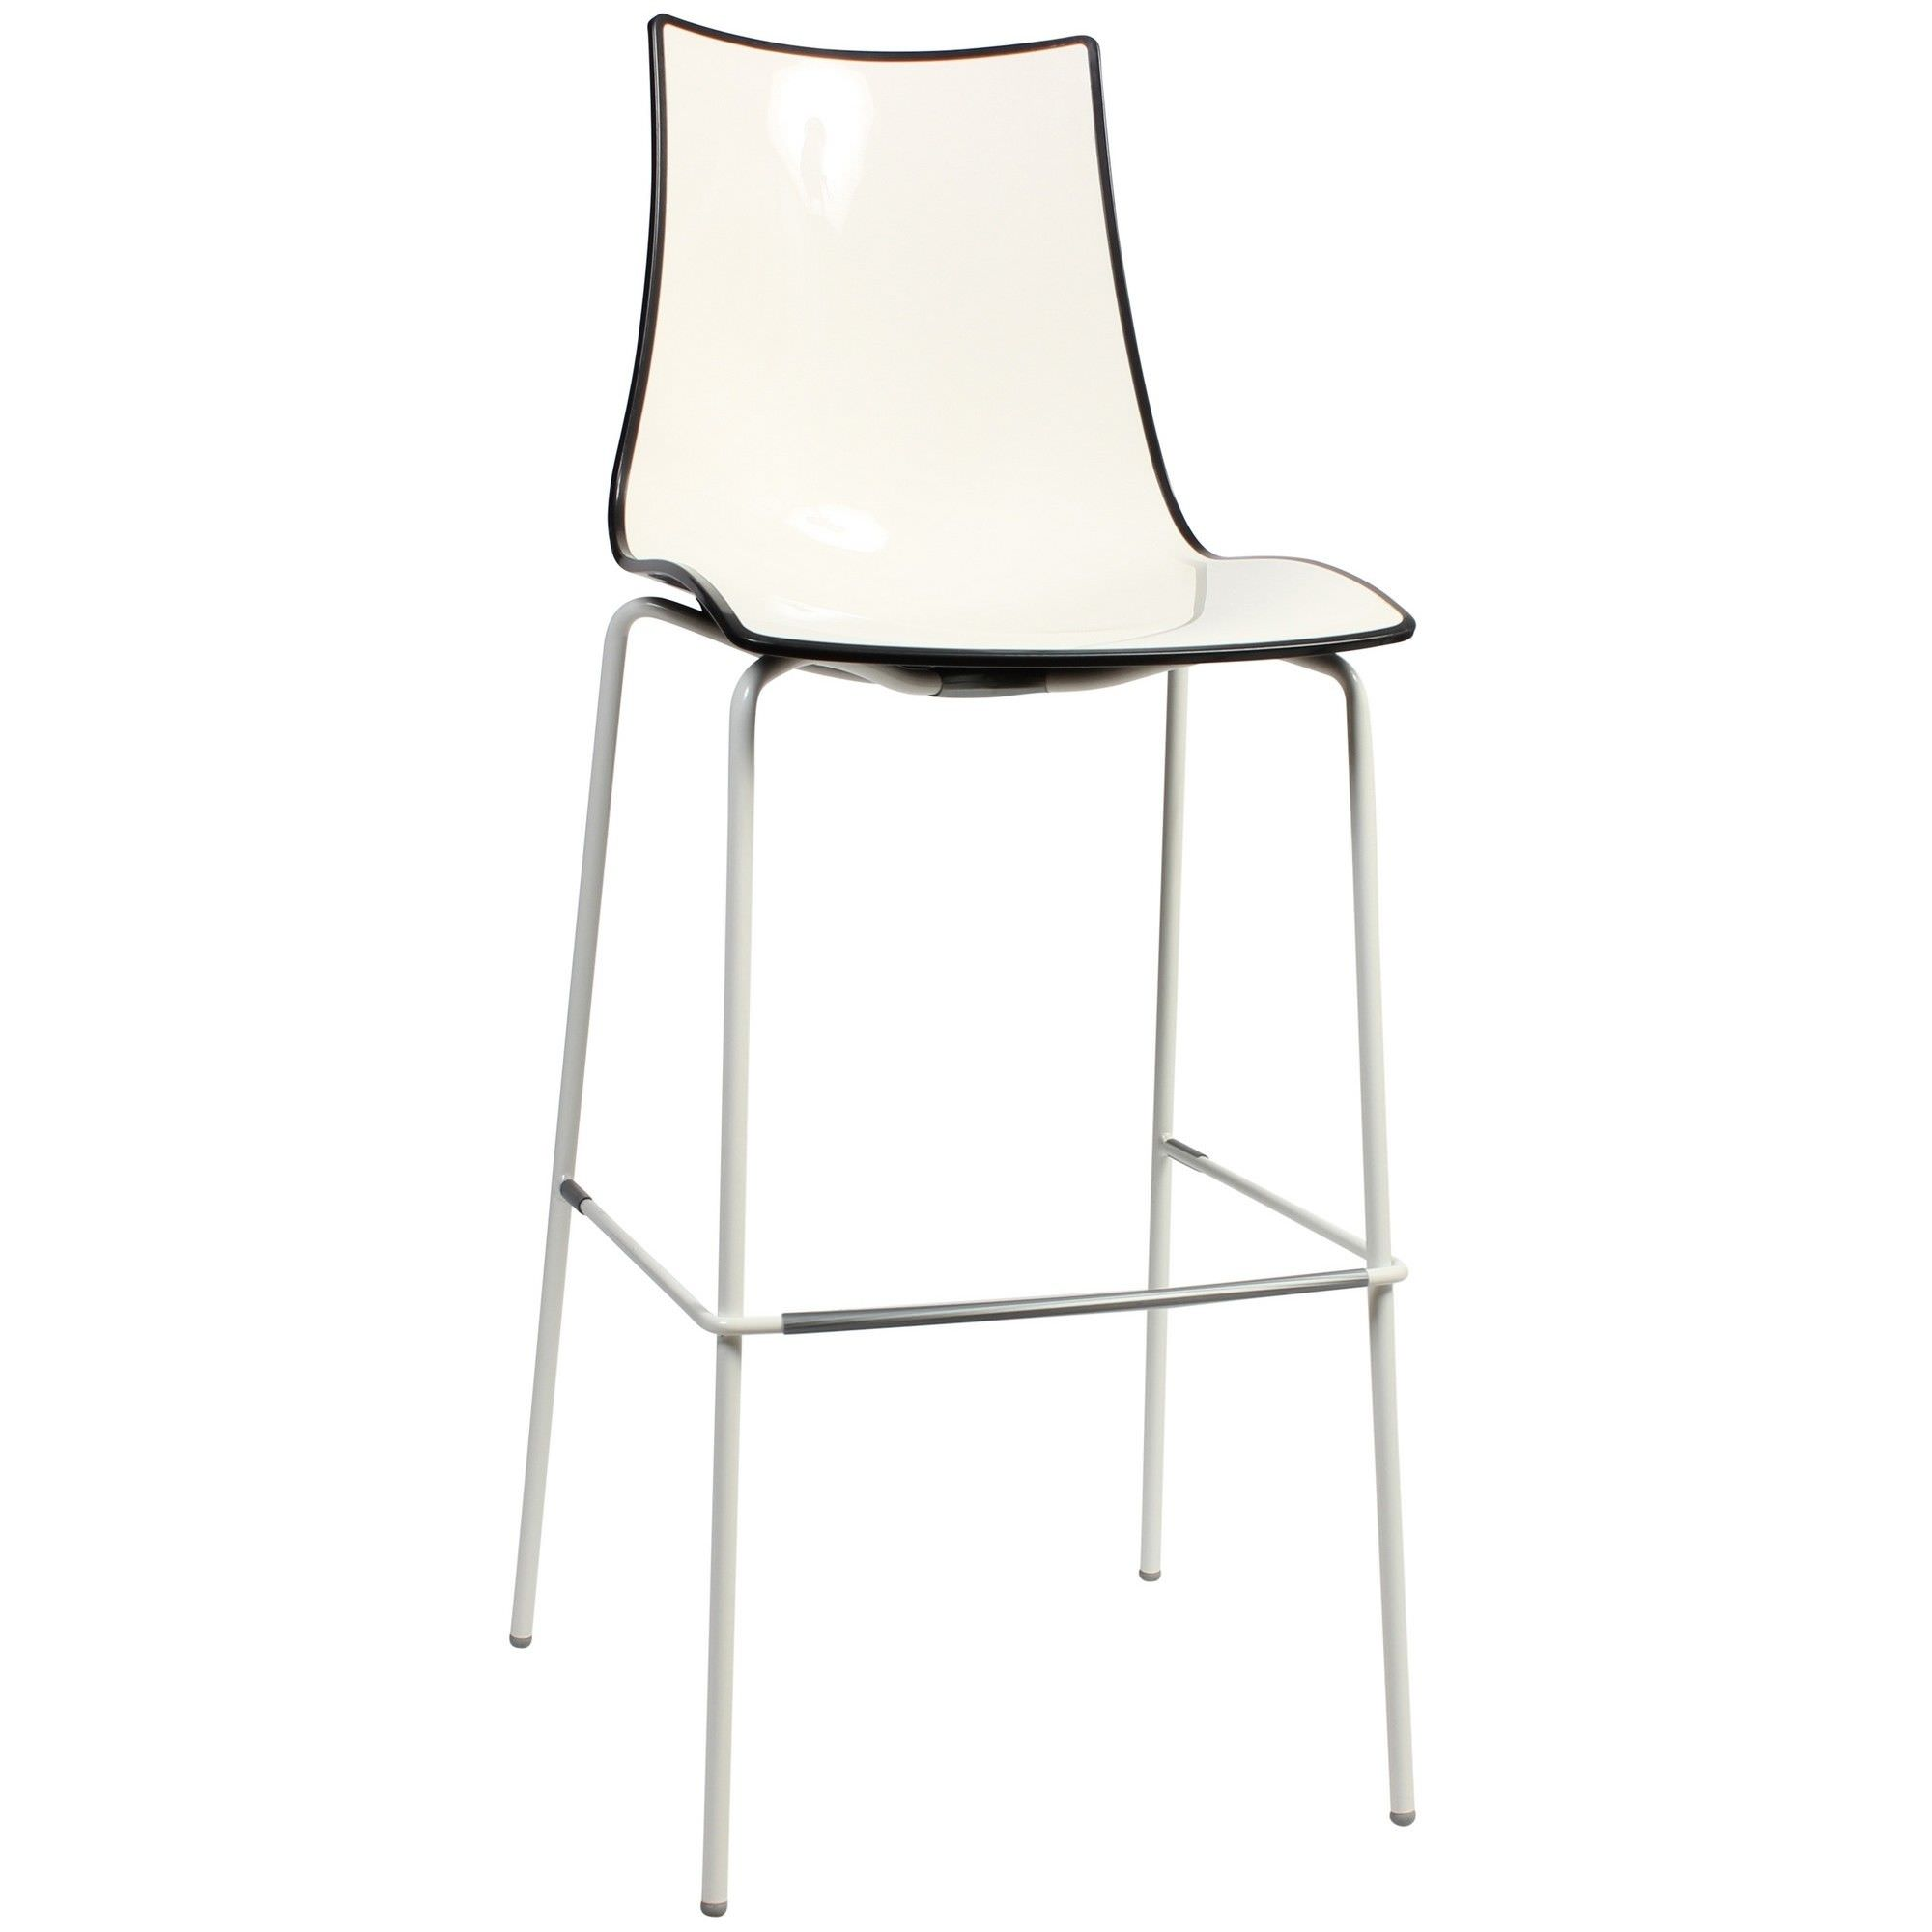 Zebra Bicolore Italian Made Commercial Grade Indoor/Outdoor Bar Stool, Metal Leg, Anthracite / White